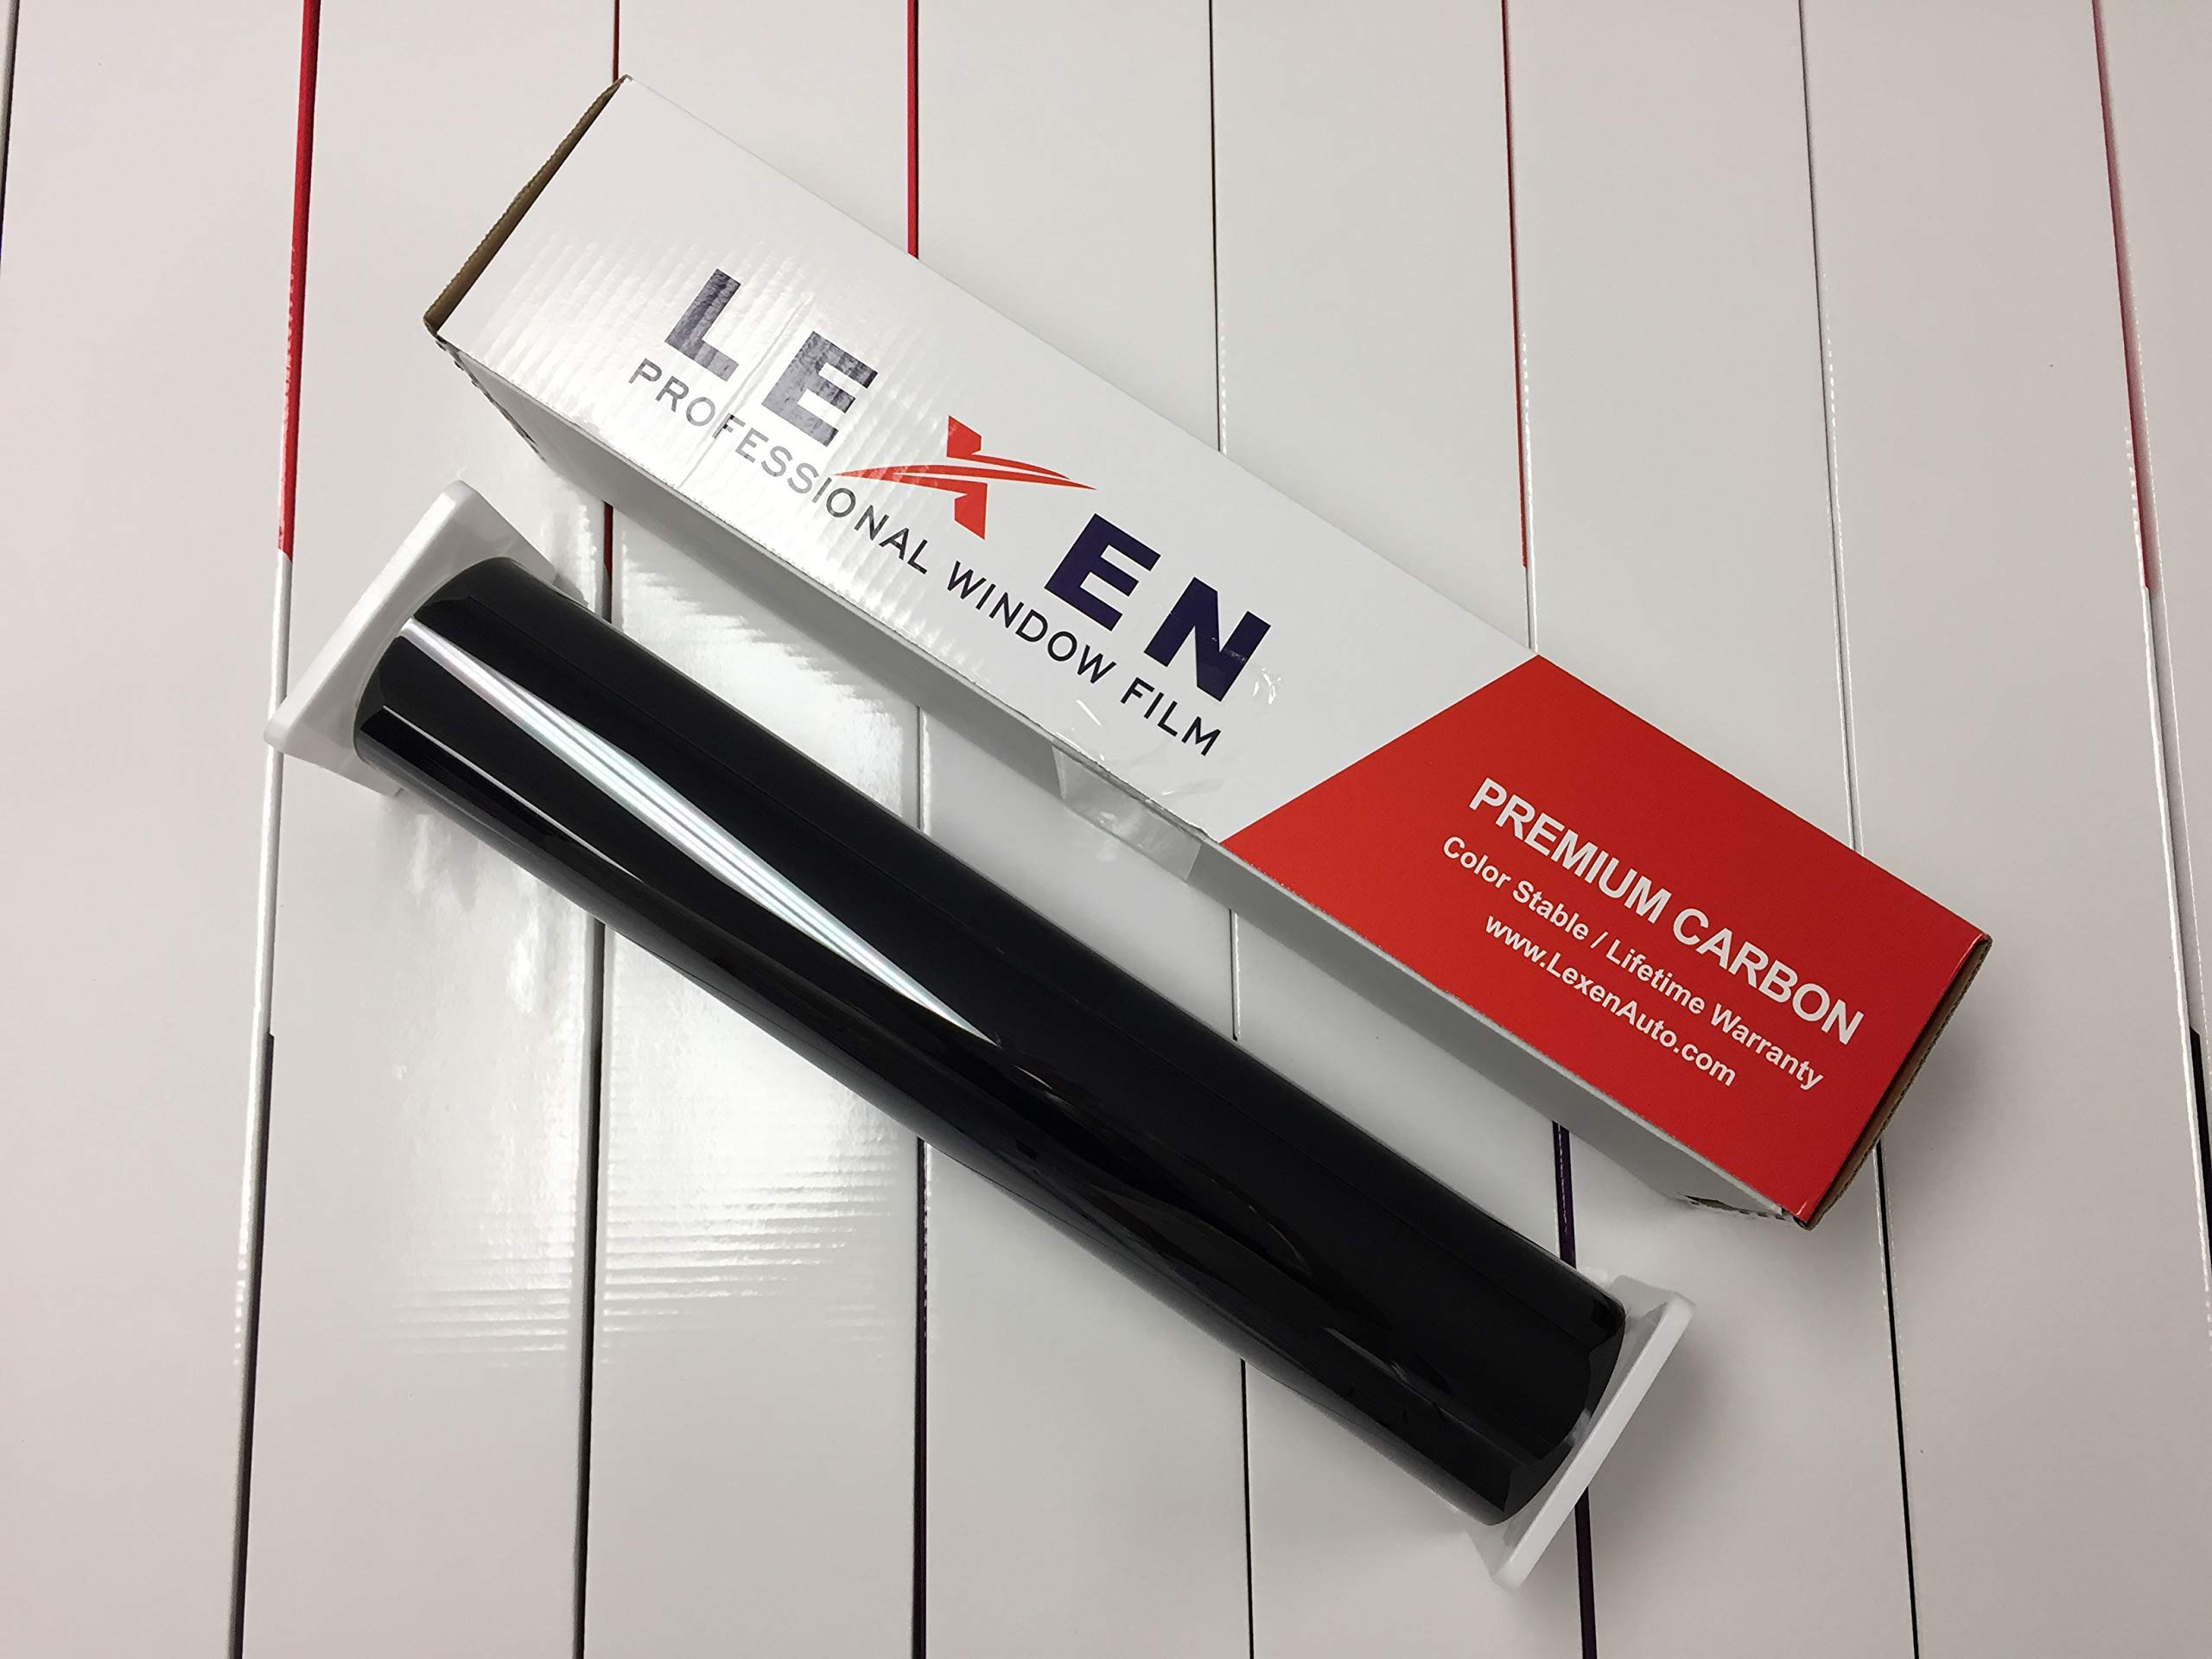 LEXEN 2Ply Premium Carbon 20'' X 100FT Roll Window Tint Film Auto Car (5% Limo (Darkest Shade)) by LEXEN (Image #2)